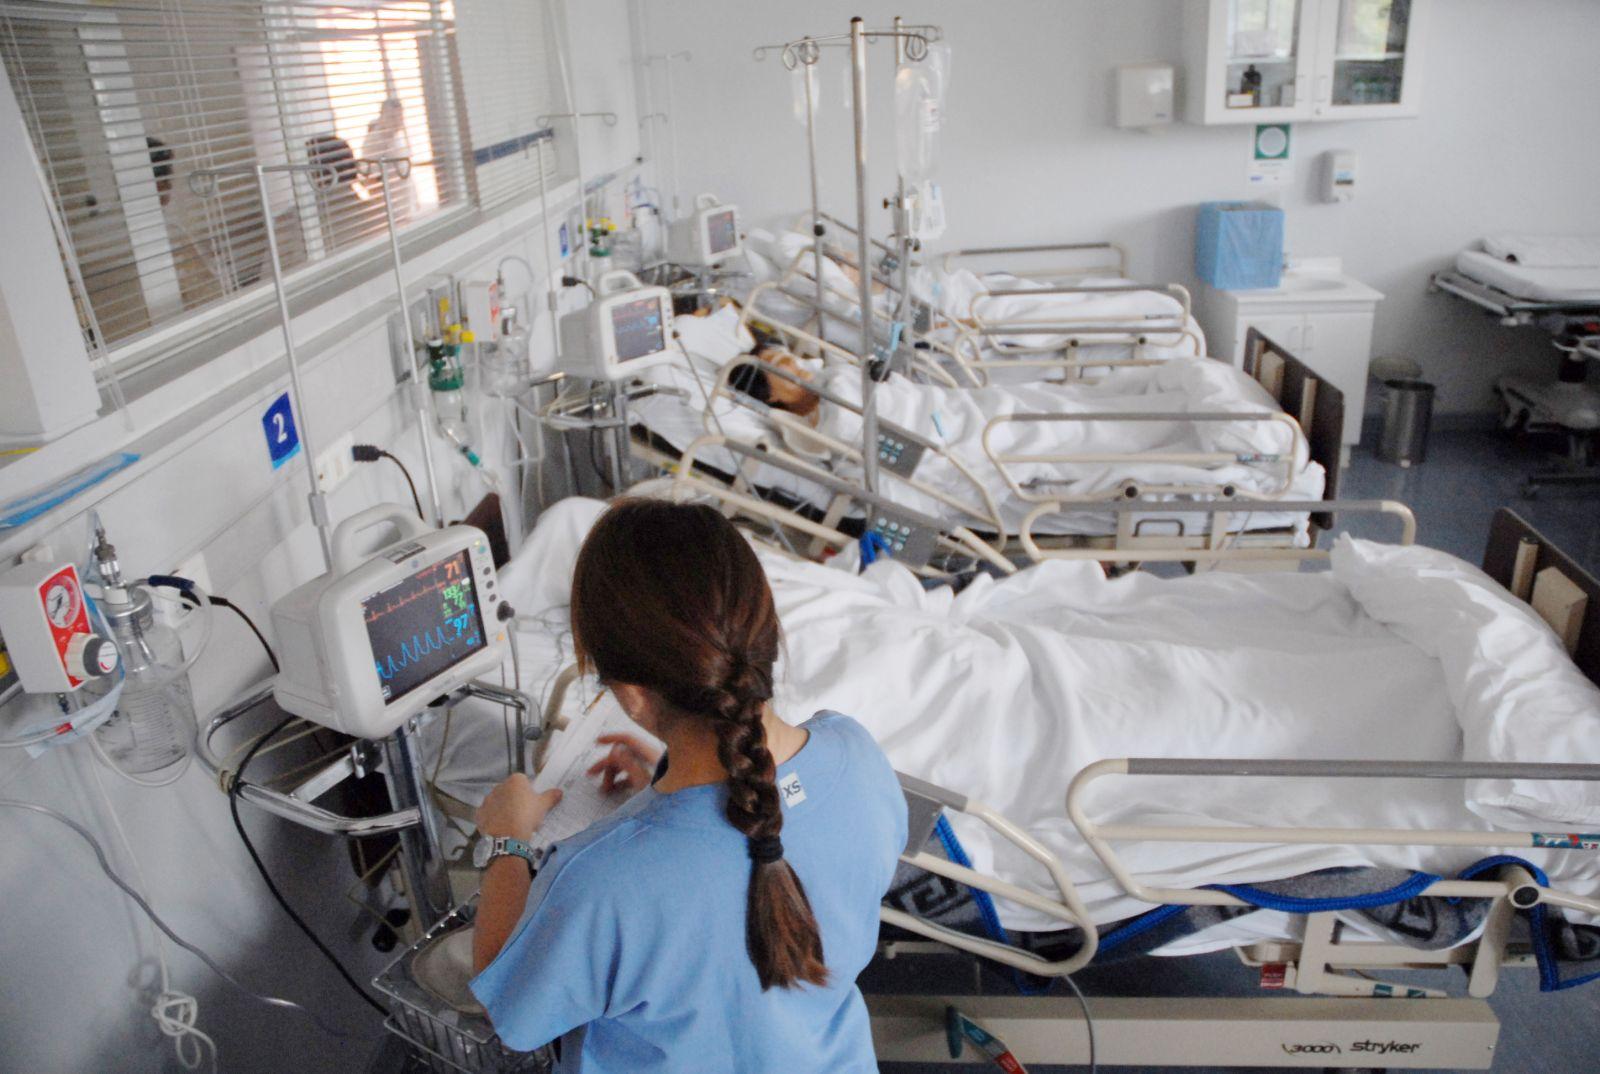 HospitalCalderón Guardiarenuevapermisos para trasplantes